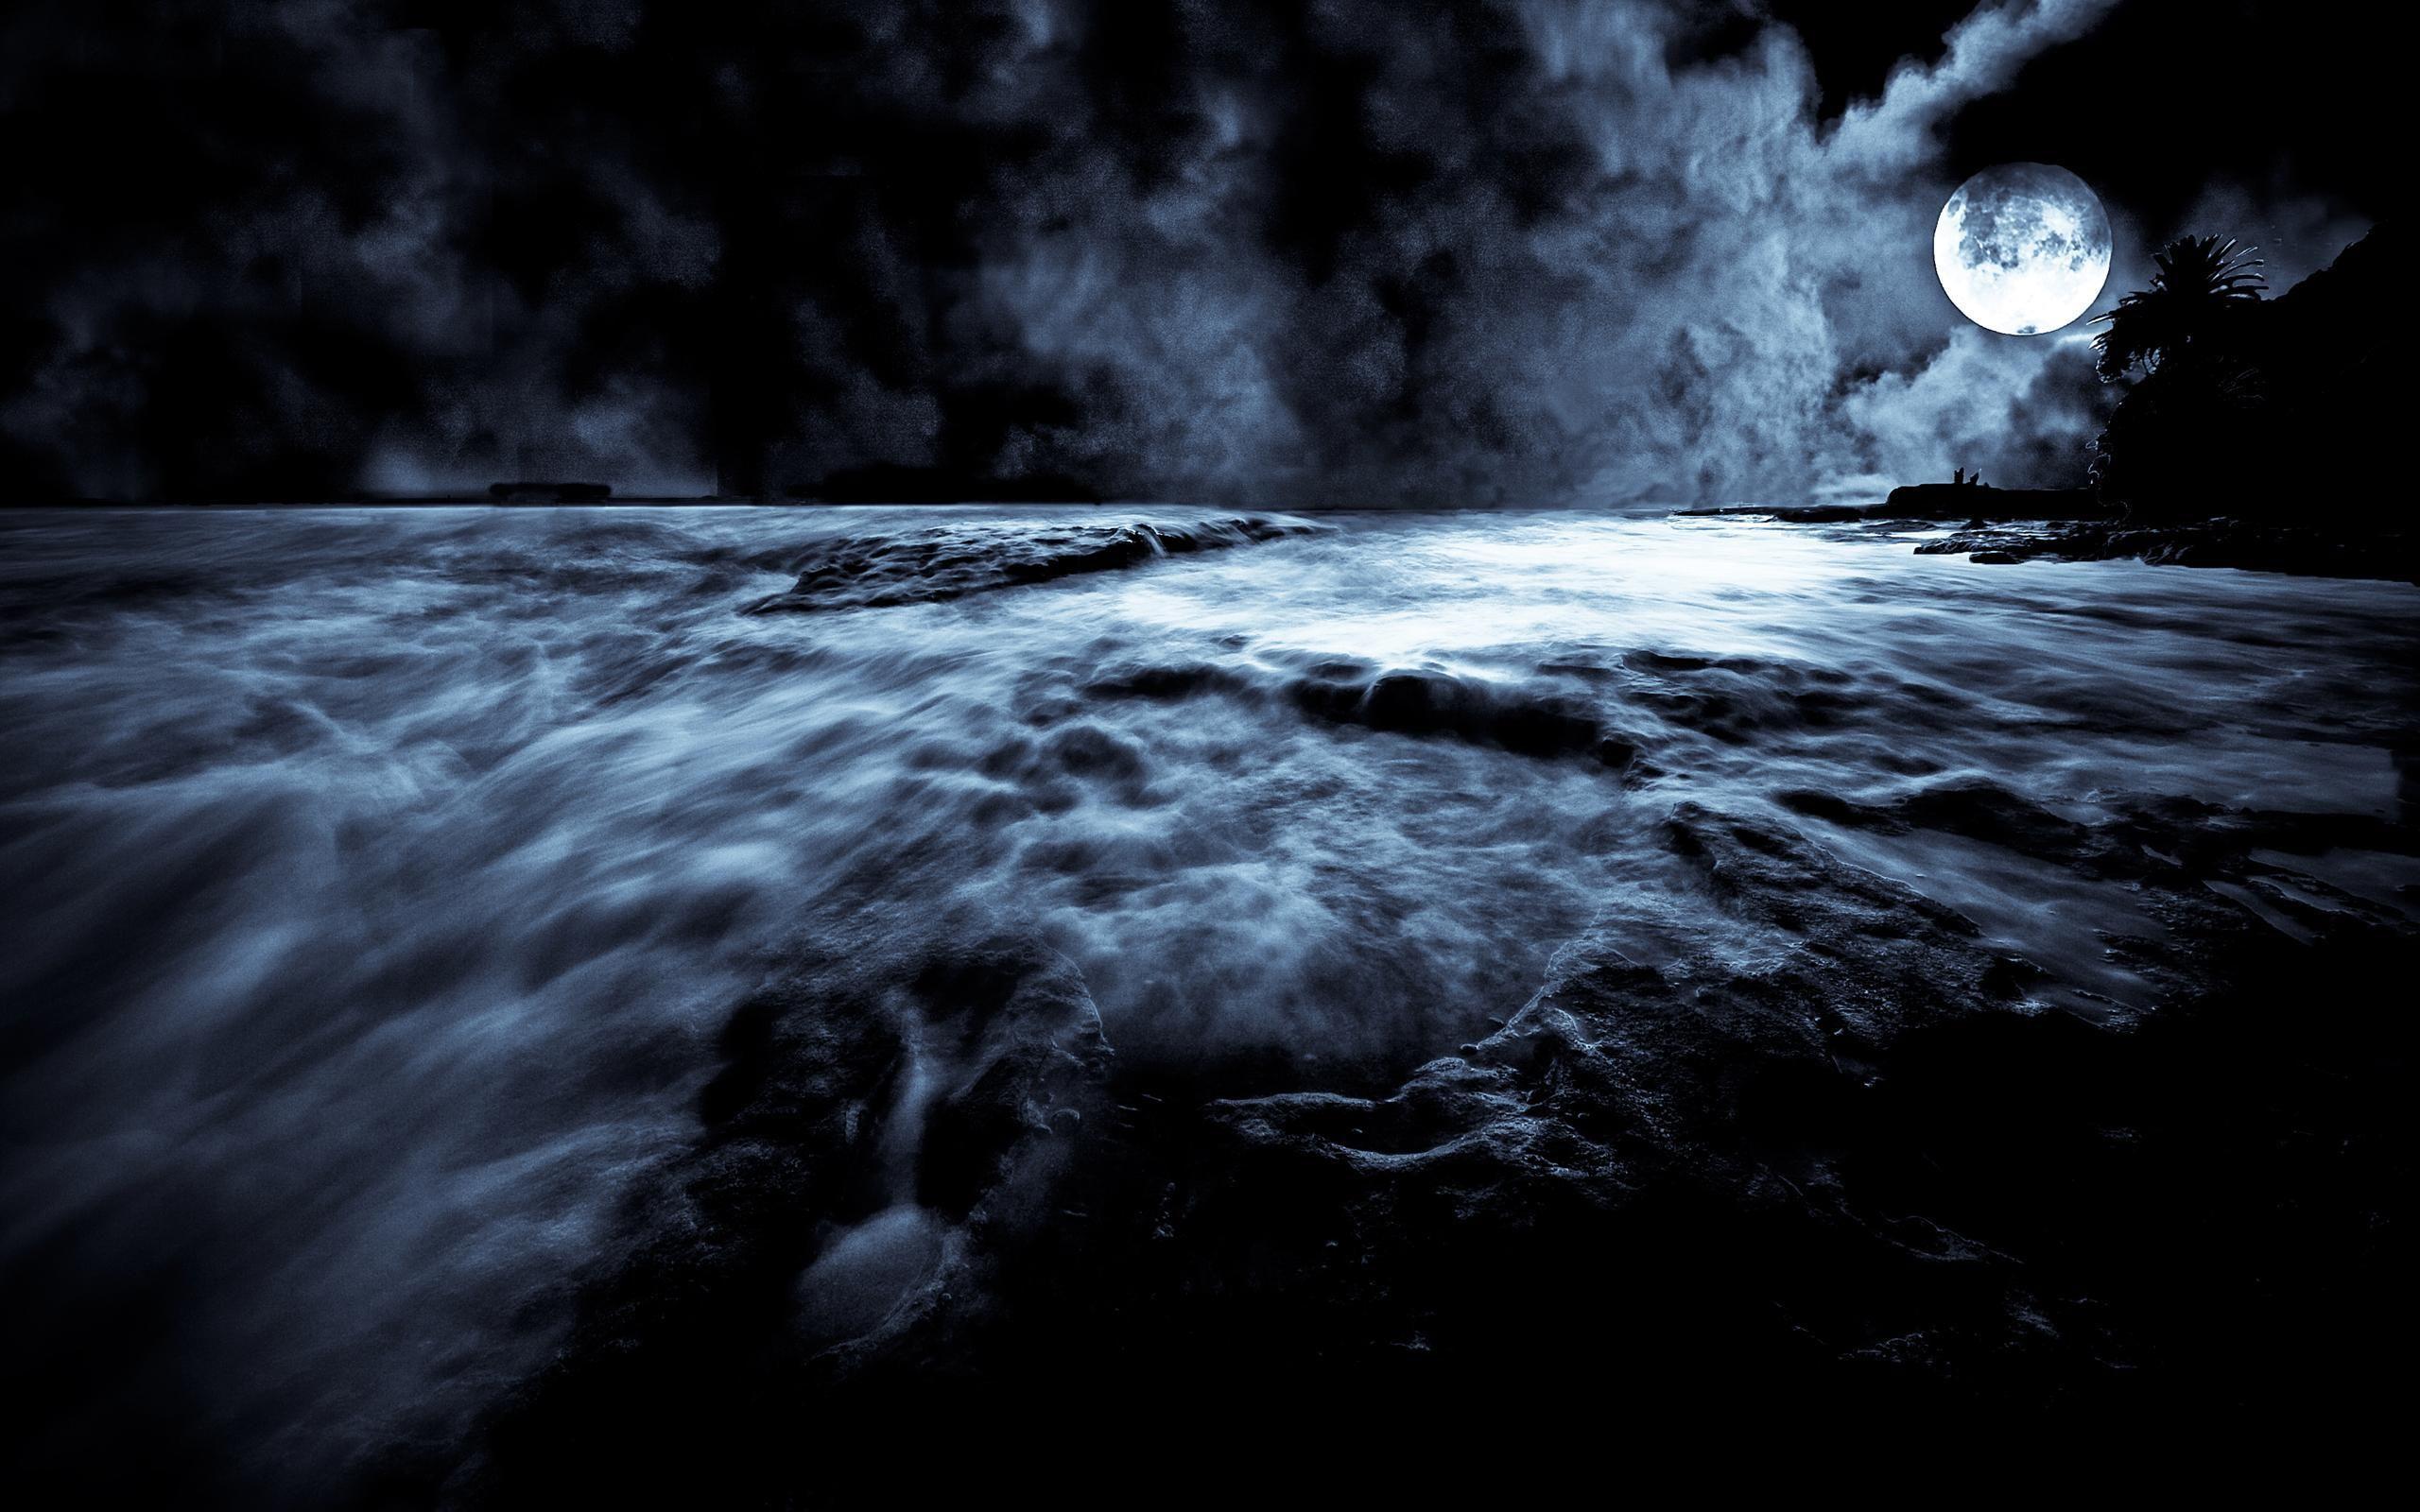 nature free night 2560x1600 | hd pic | feelgrafix | pinterest